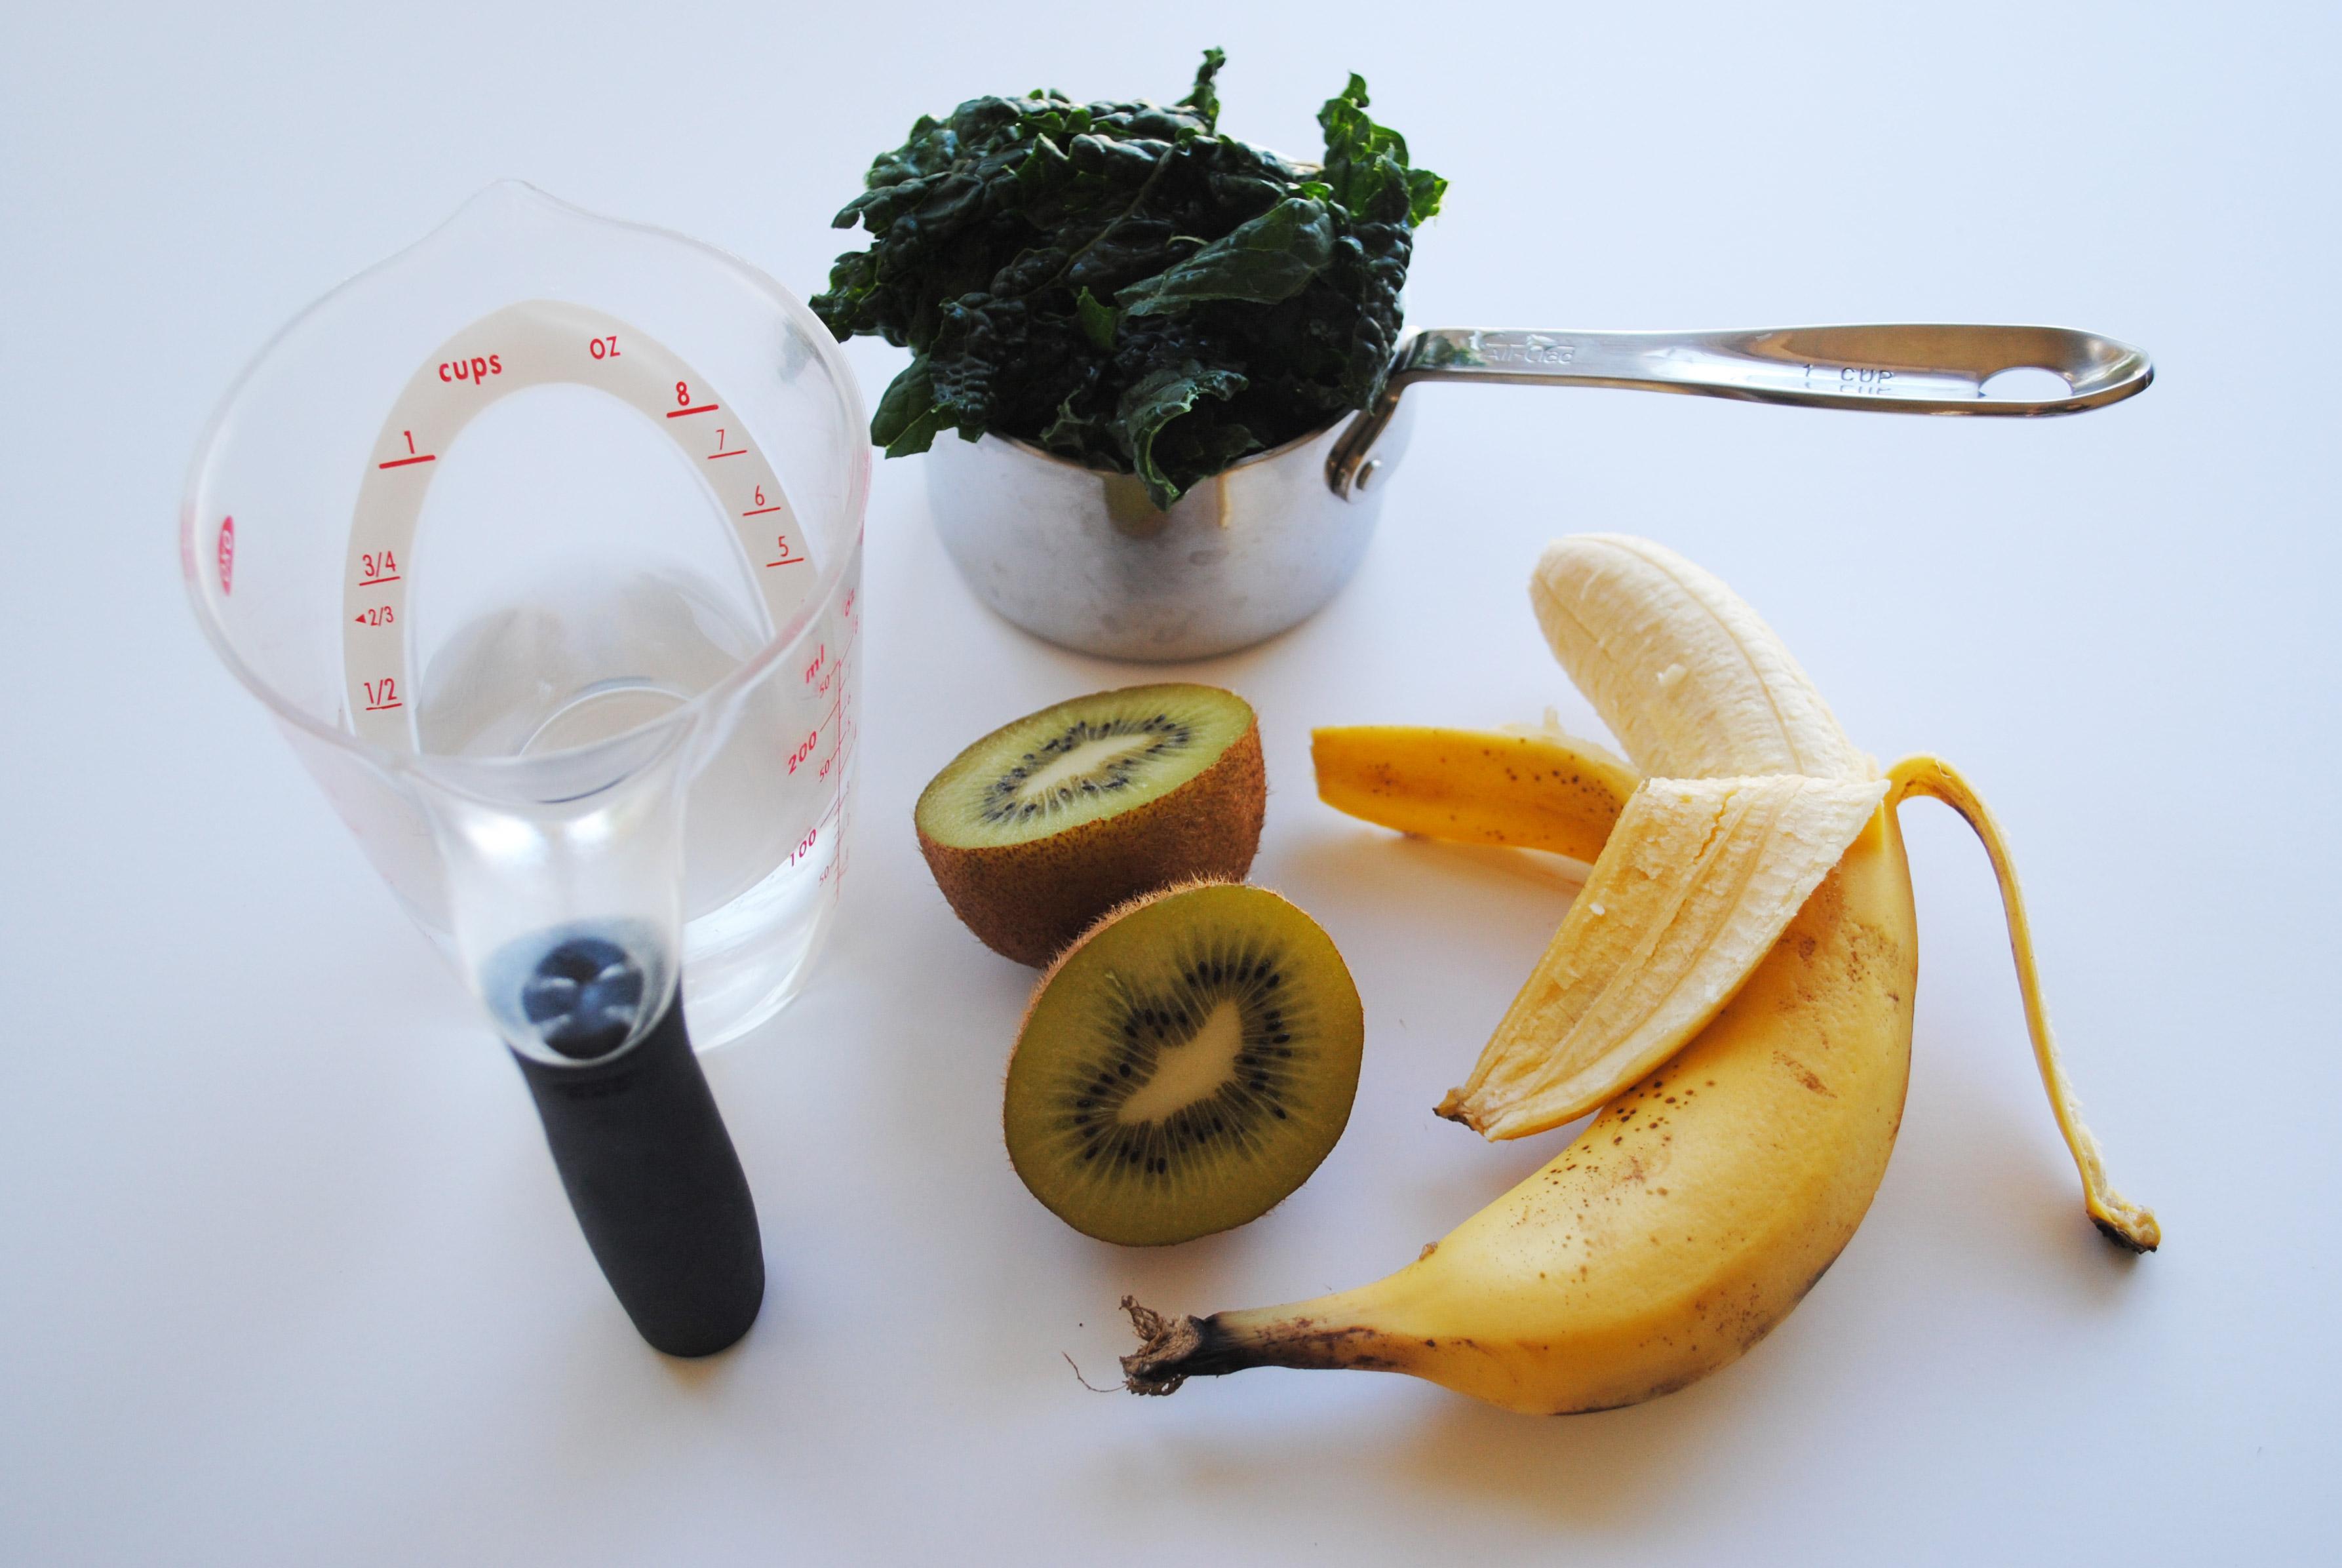 Kale Super-Start Smoothie Ingredients